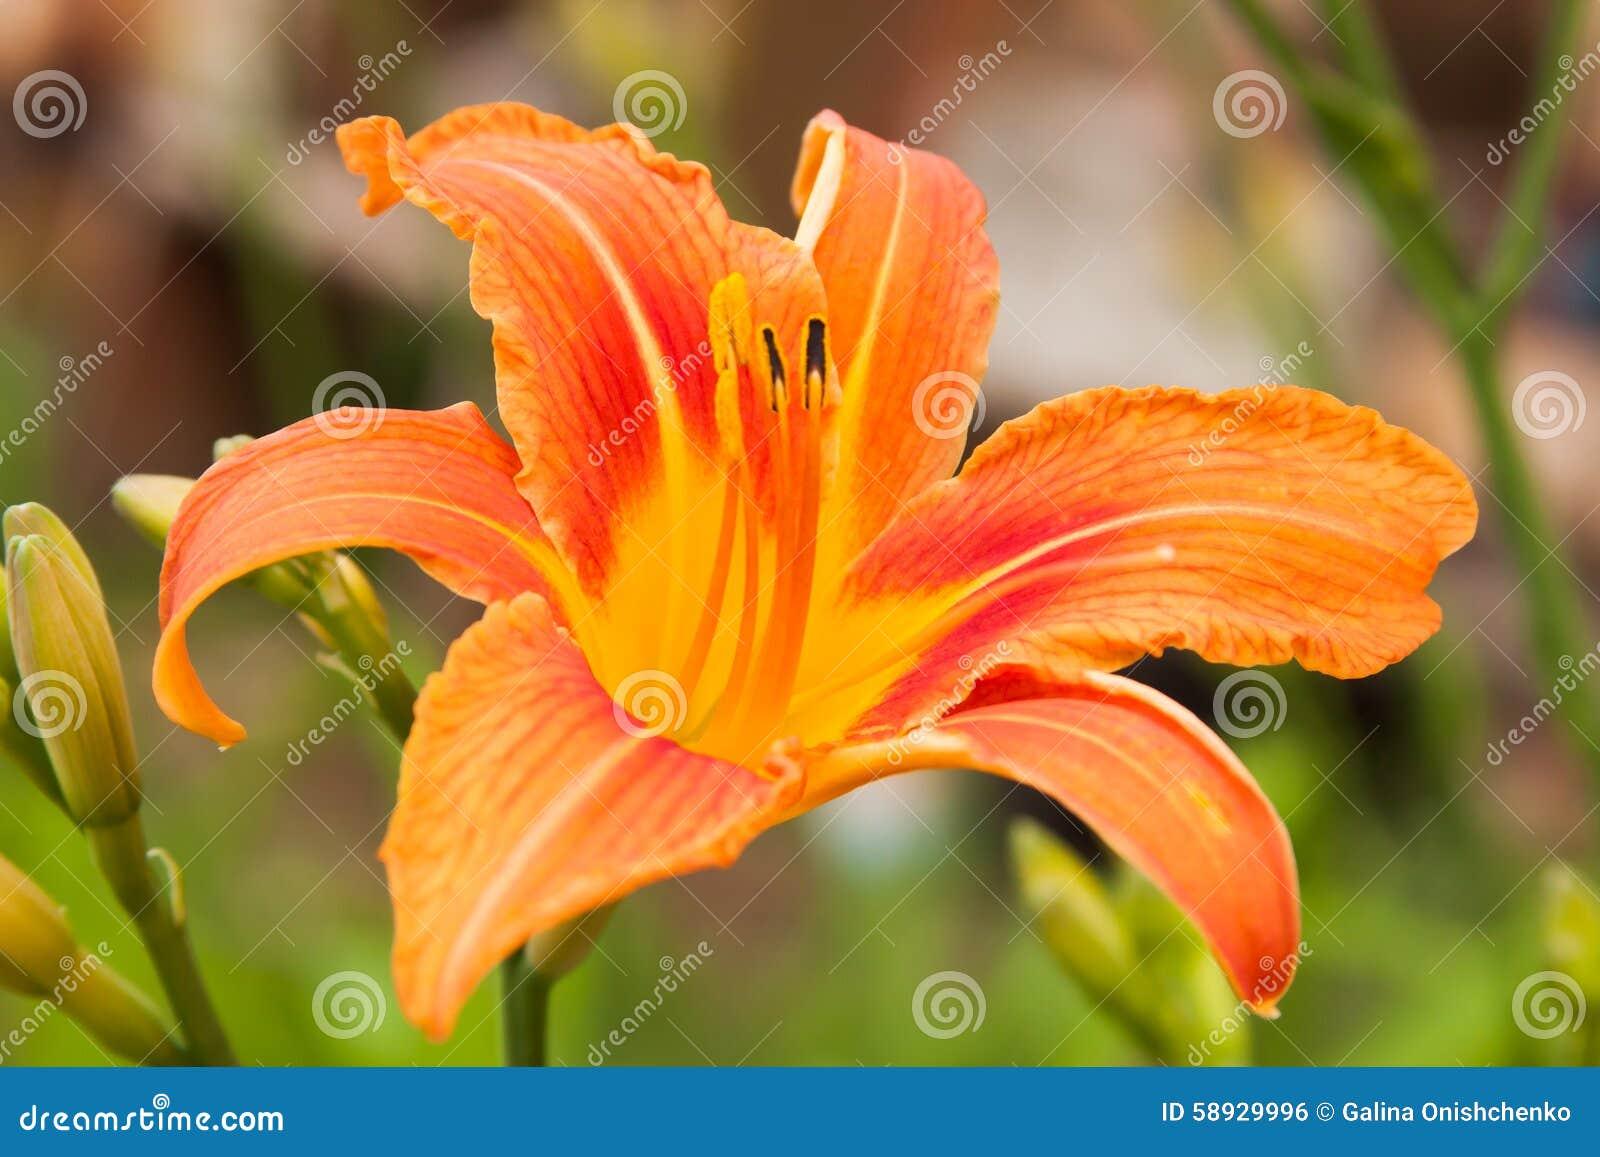 Bright orange flowers of lily stock photo image of color download bright orange flowers of lily stock photo image of color vegetable 58929996 izmirmasajfo